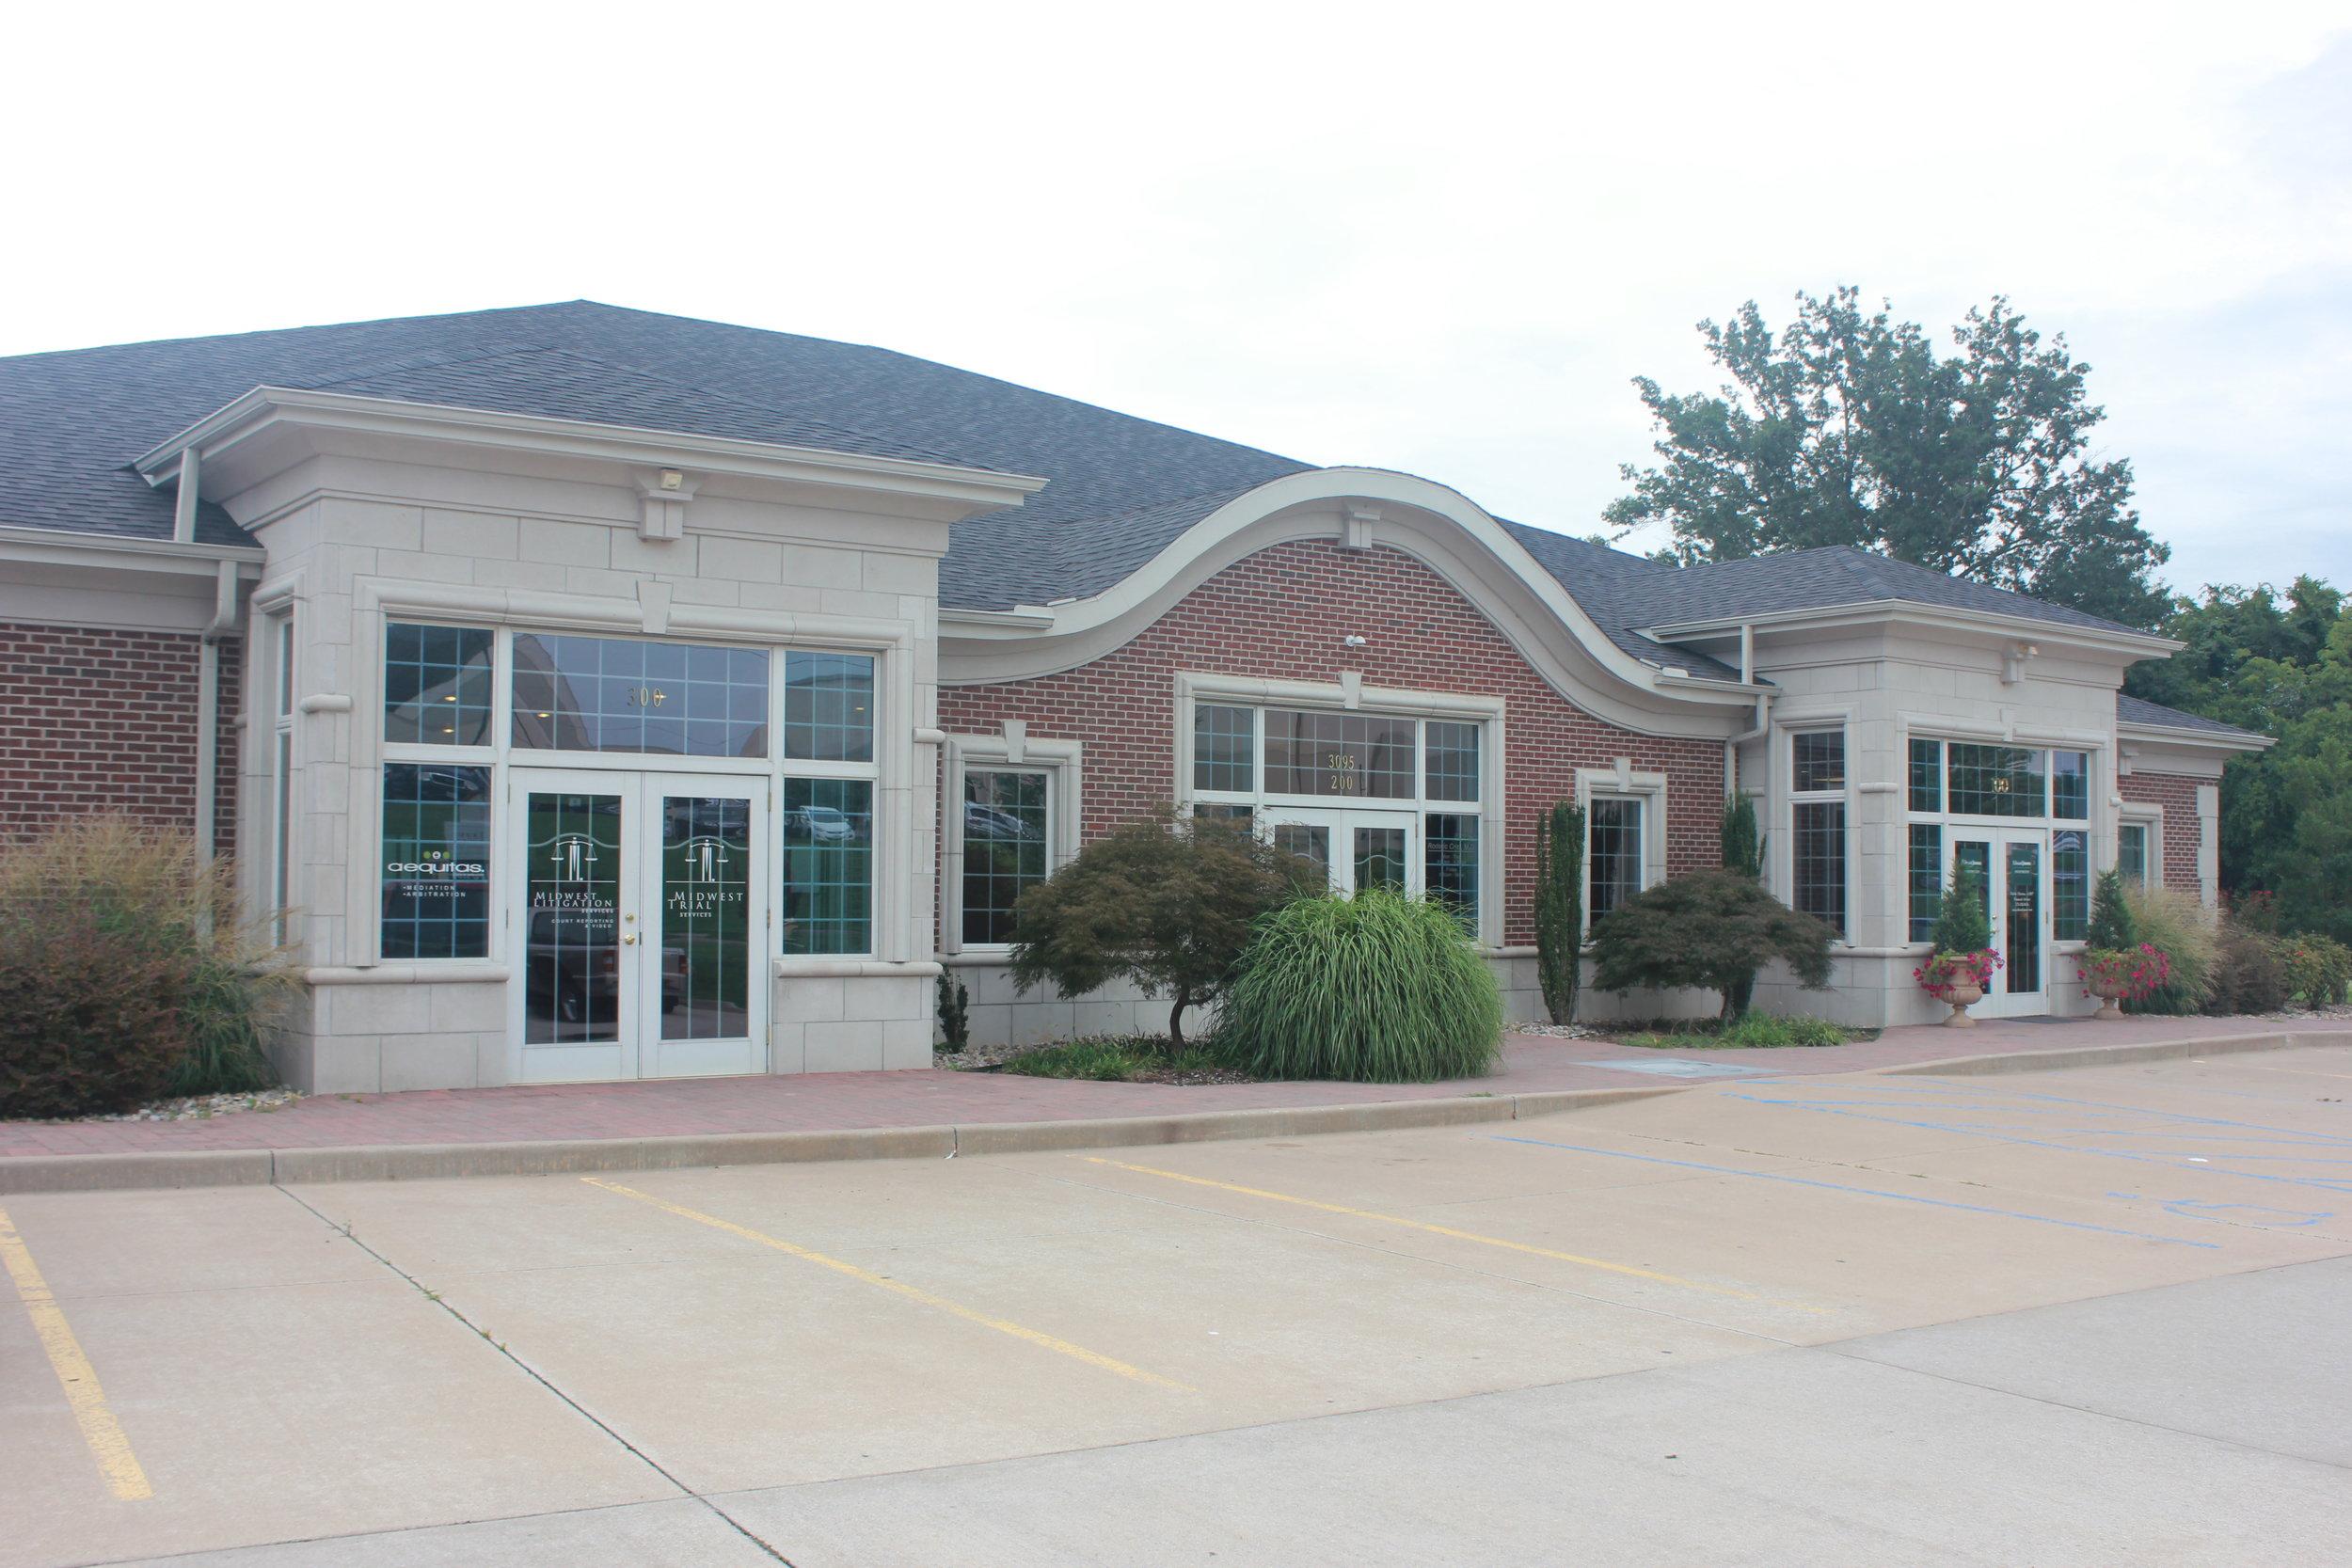 Rivendell Court - Cape Girardeau, Missouri